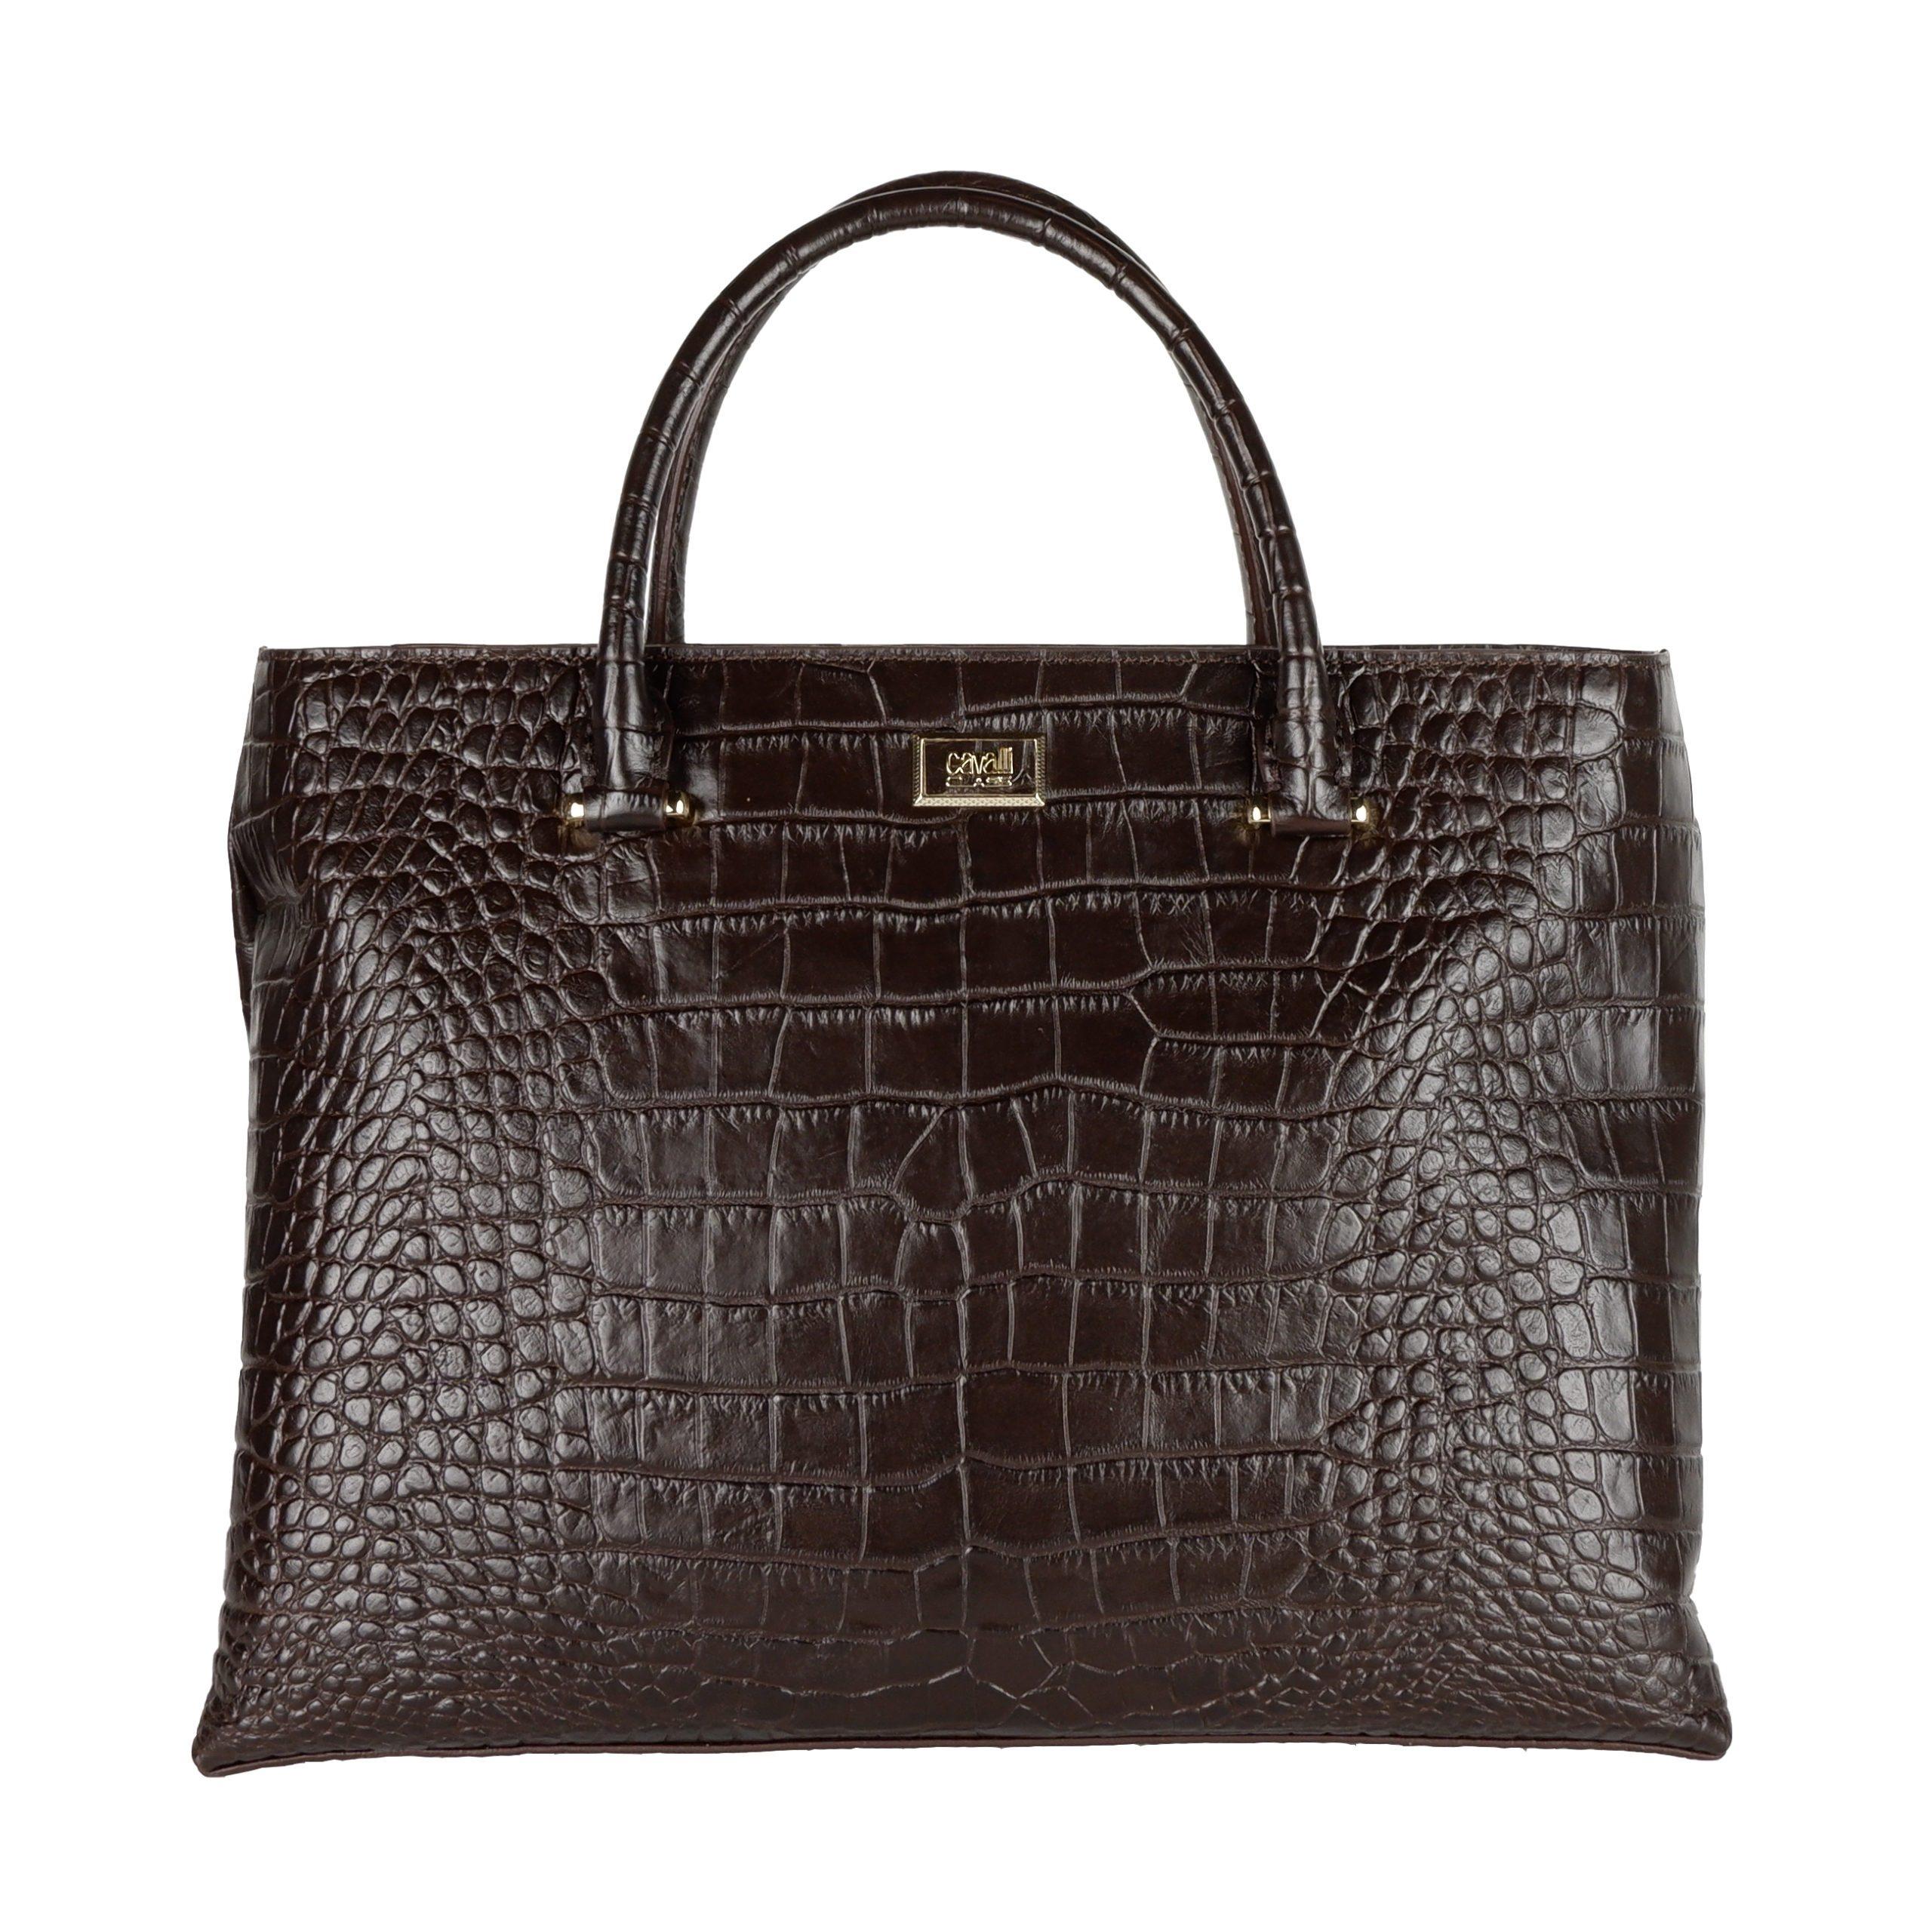 Cavalli Class Women's Handbag Dark Brown CA1421196